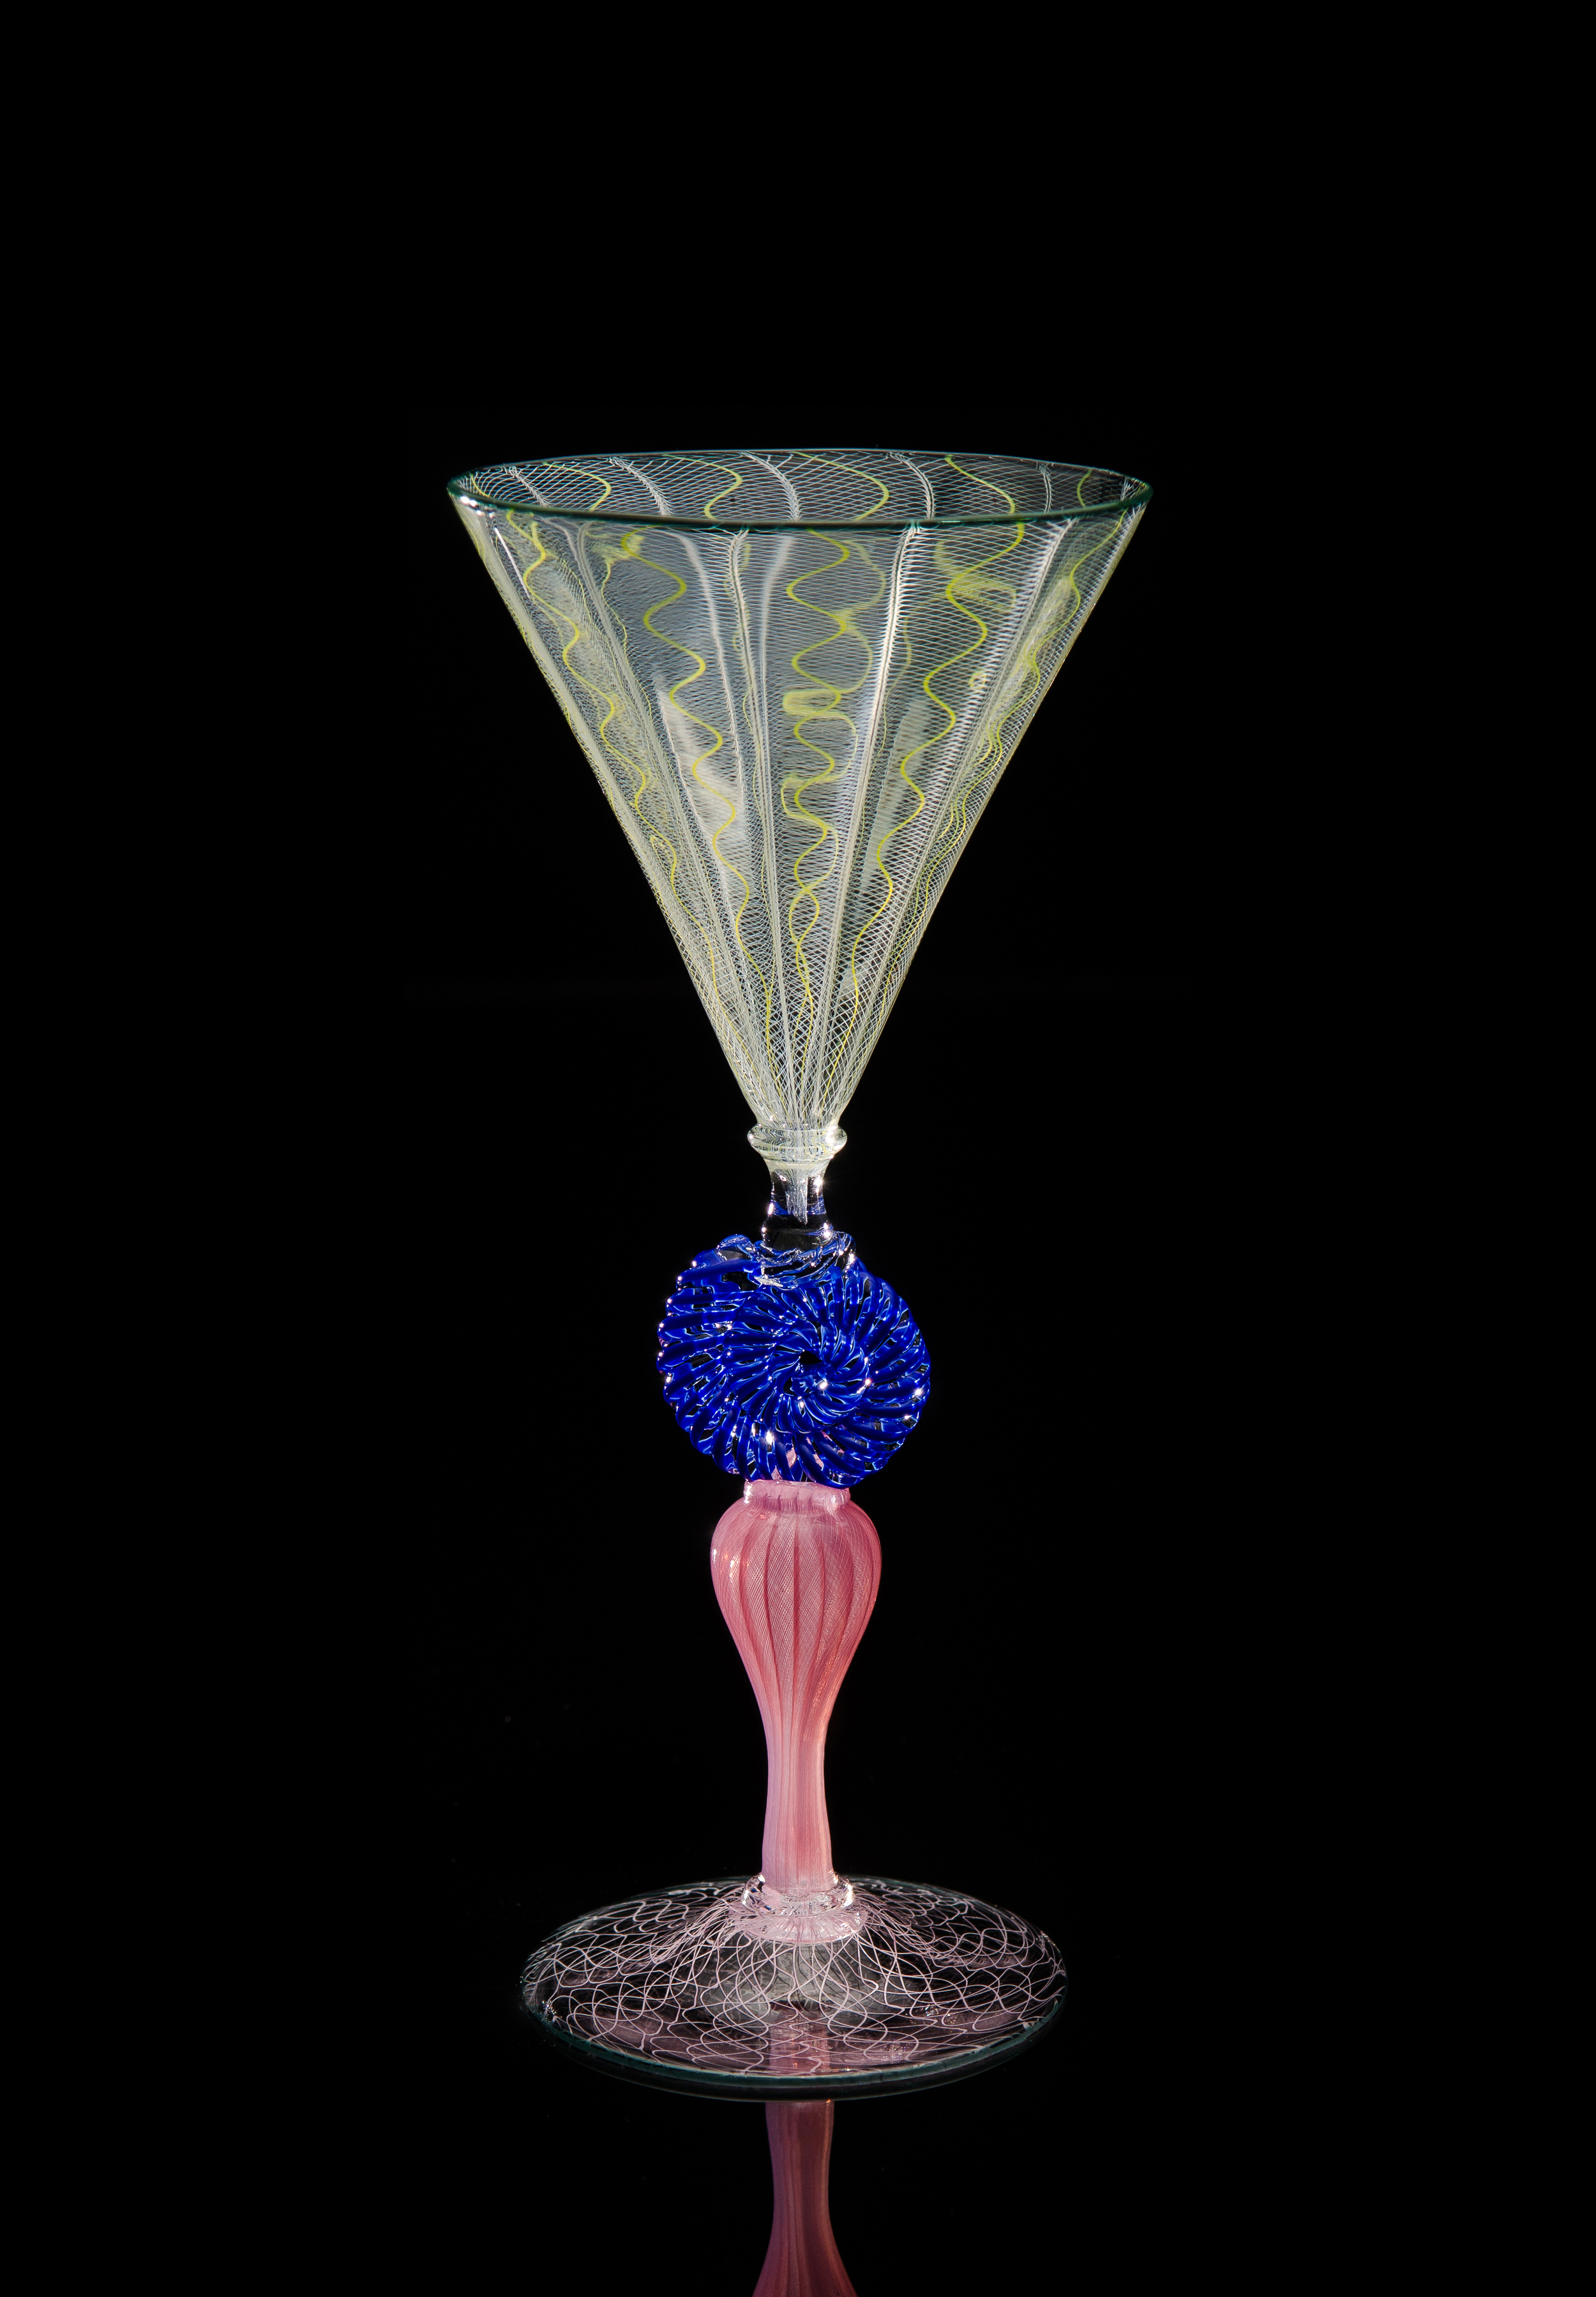 Lino Tagliapietra, Goblet (1991-1994, glass, 9 1/4 x 4 3/16 x 4 3/16 inches), LT.17